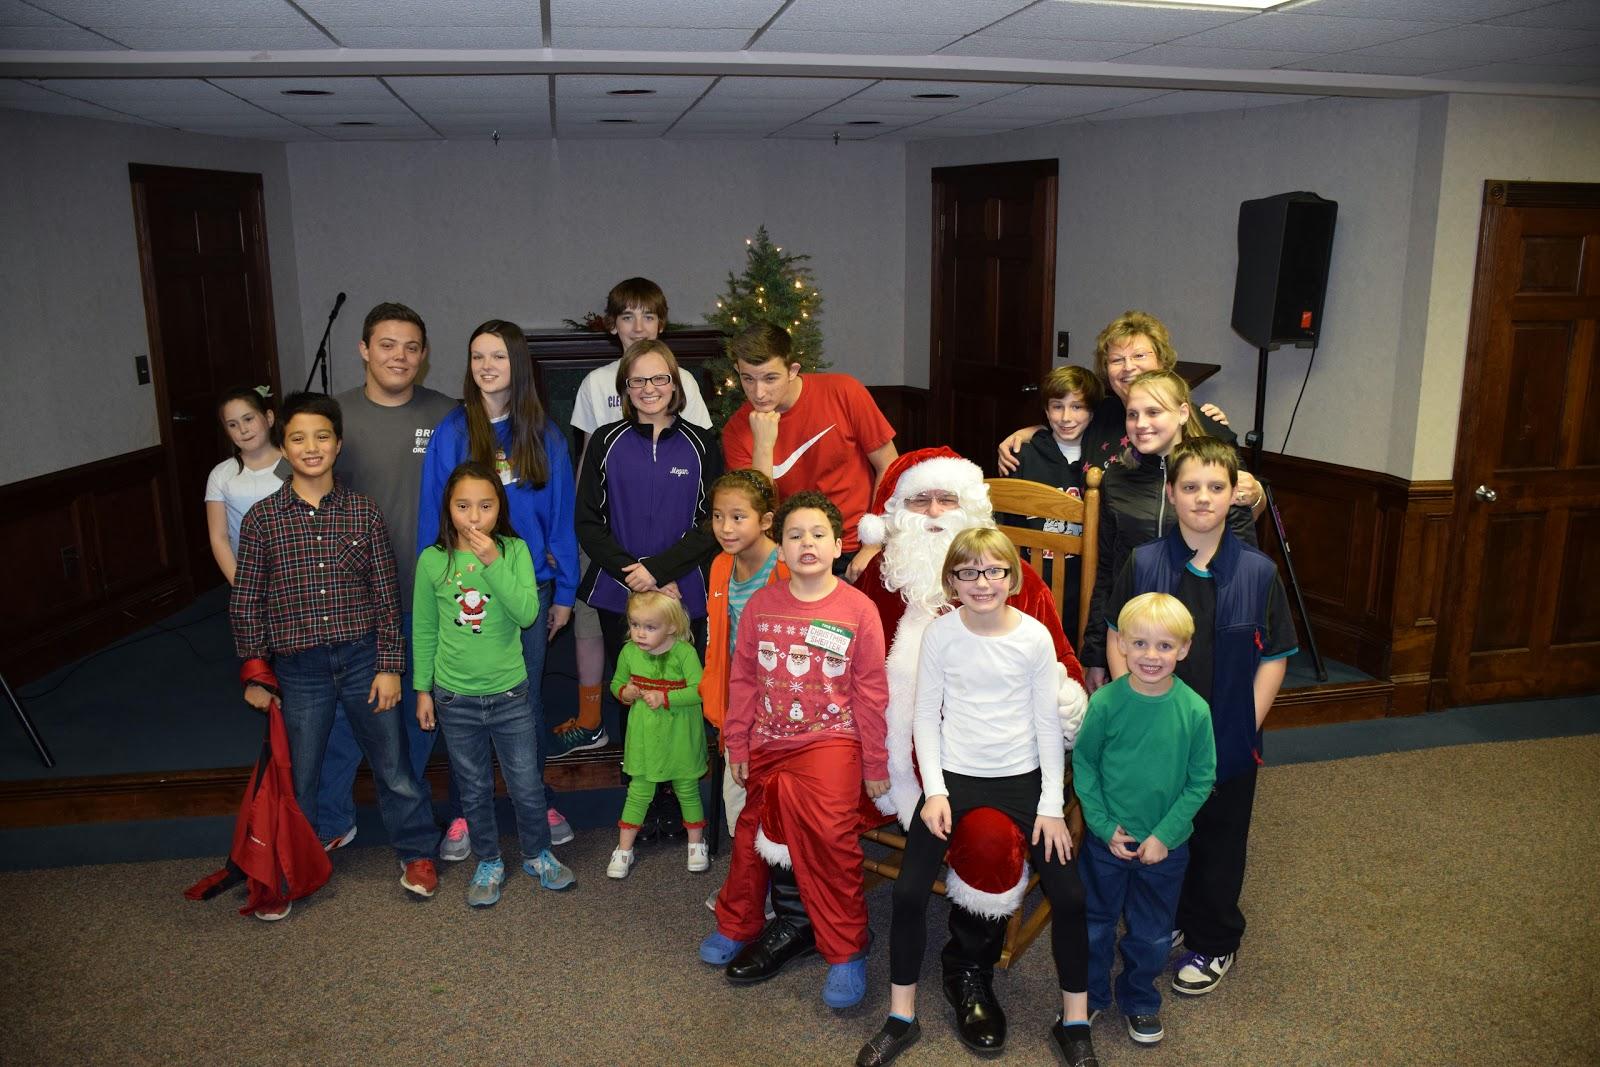 Christmas Around Northgate (Talent Show)